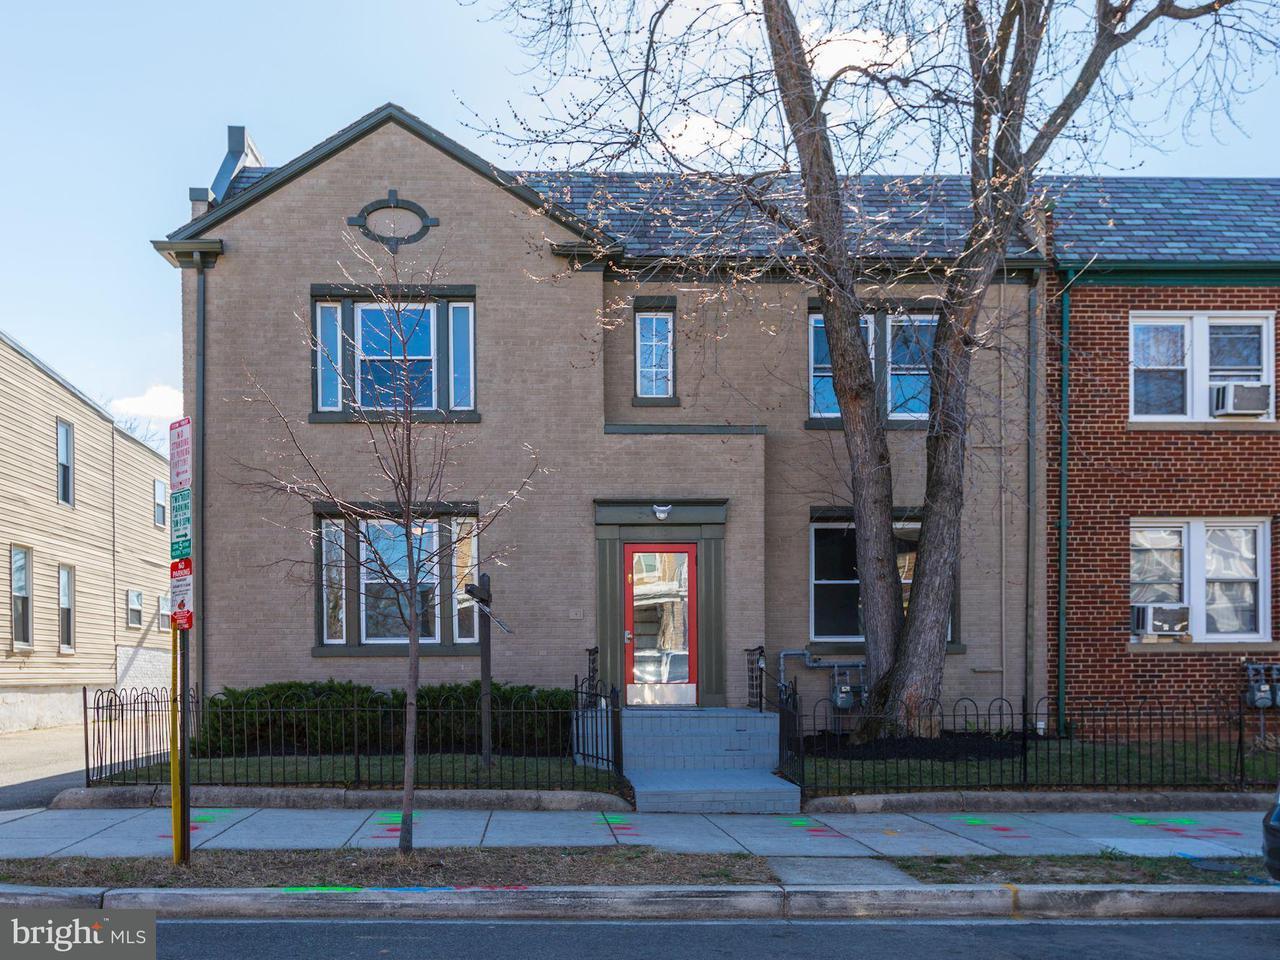 Multi-Family Home for Sale at 1315 Montello Ave Ne 1315 Montello Ave Ne Washington, District Of Columbia 20002 United States